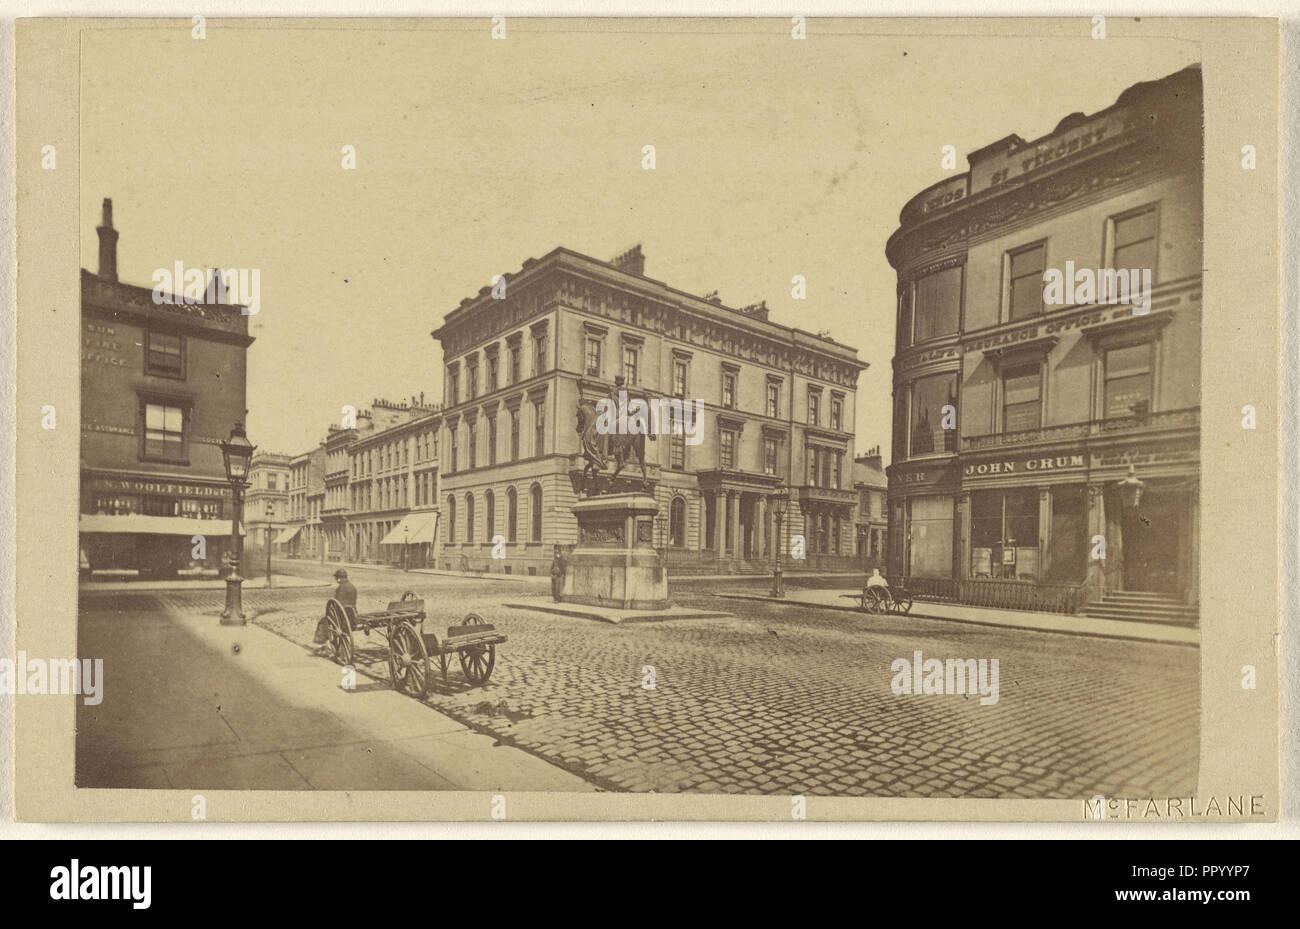 Queen's Statue & Club House, Glasgow; H. Macfarlane, Scottish, active Glasgow, Scotland 1860s, 1864 - 1865; Albumen silver - Stock Image